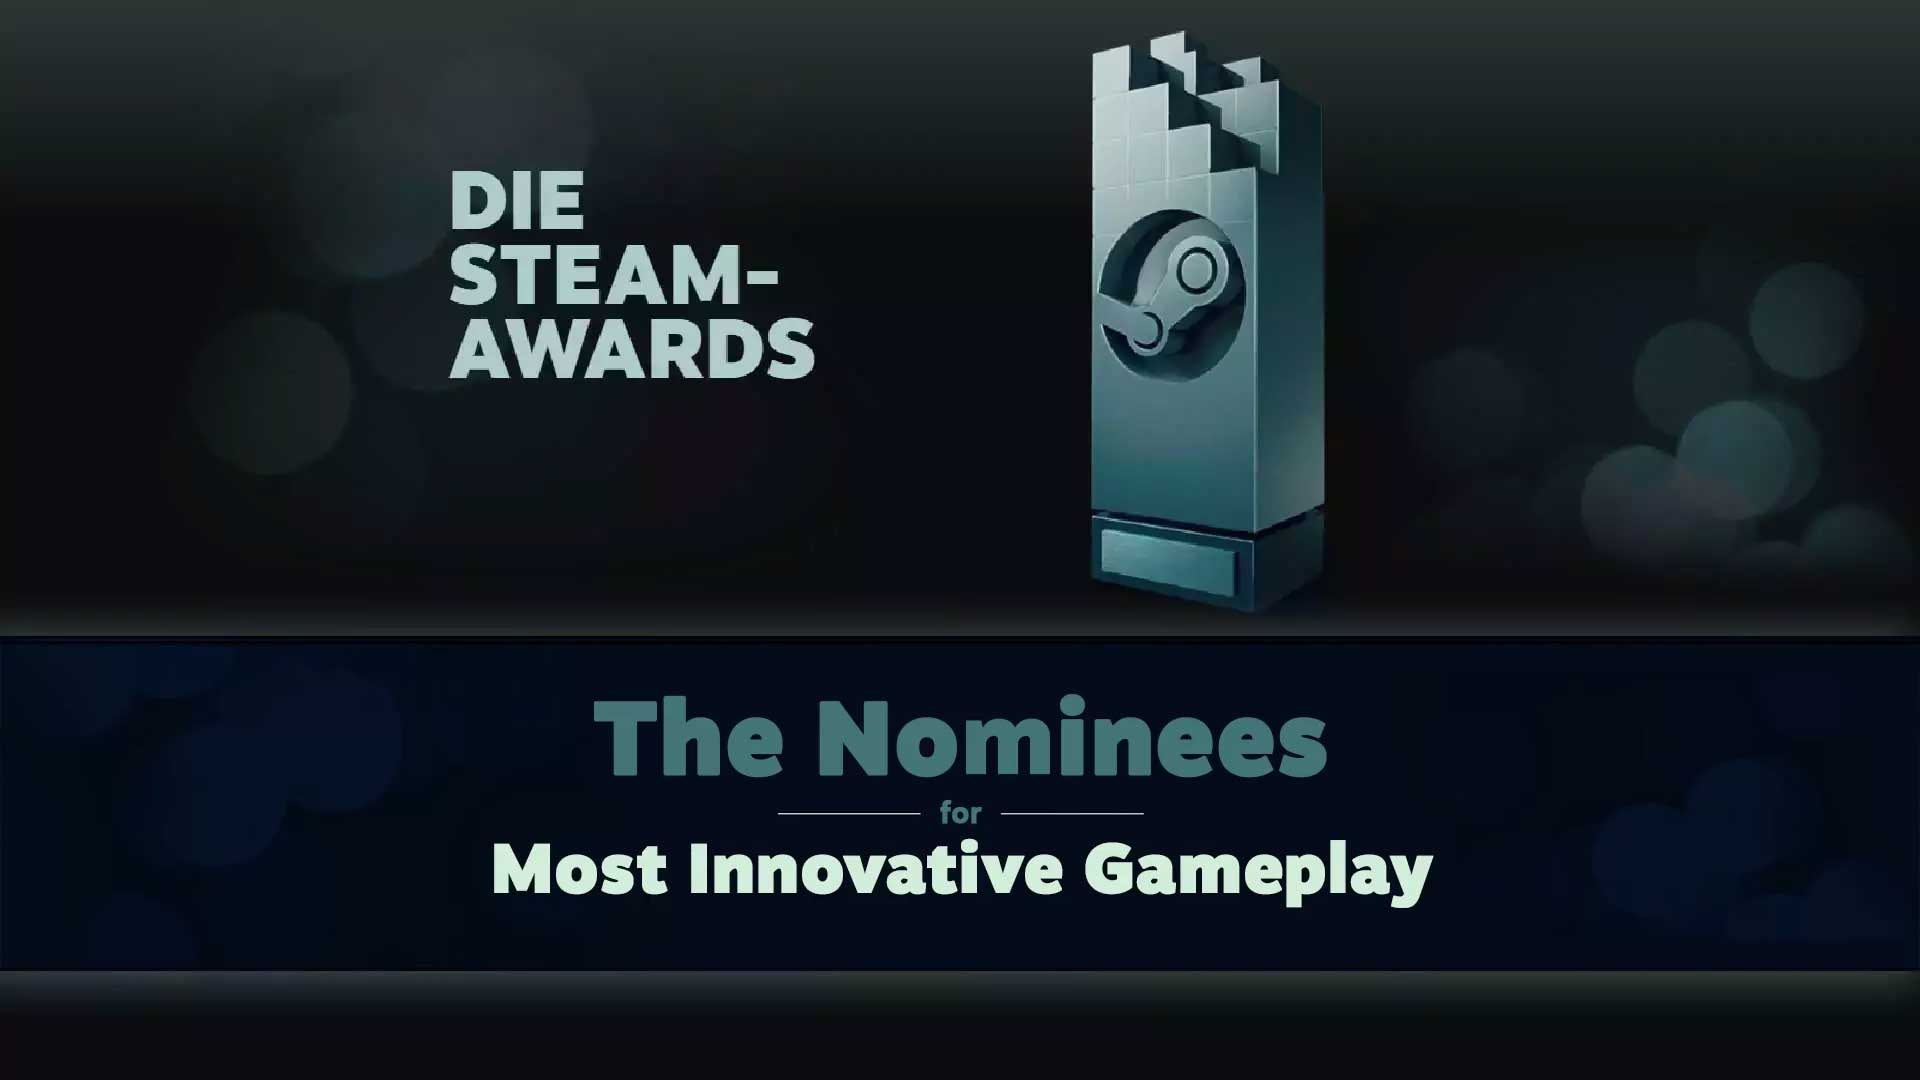 steam awards 2019 innovative gameplay cover